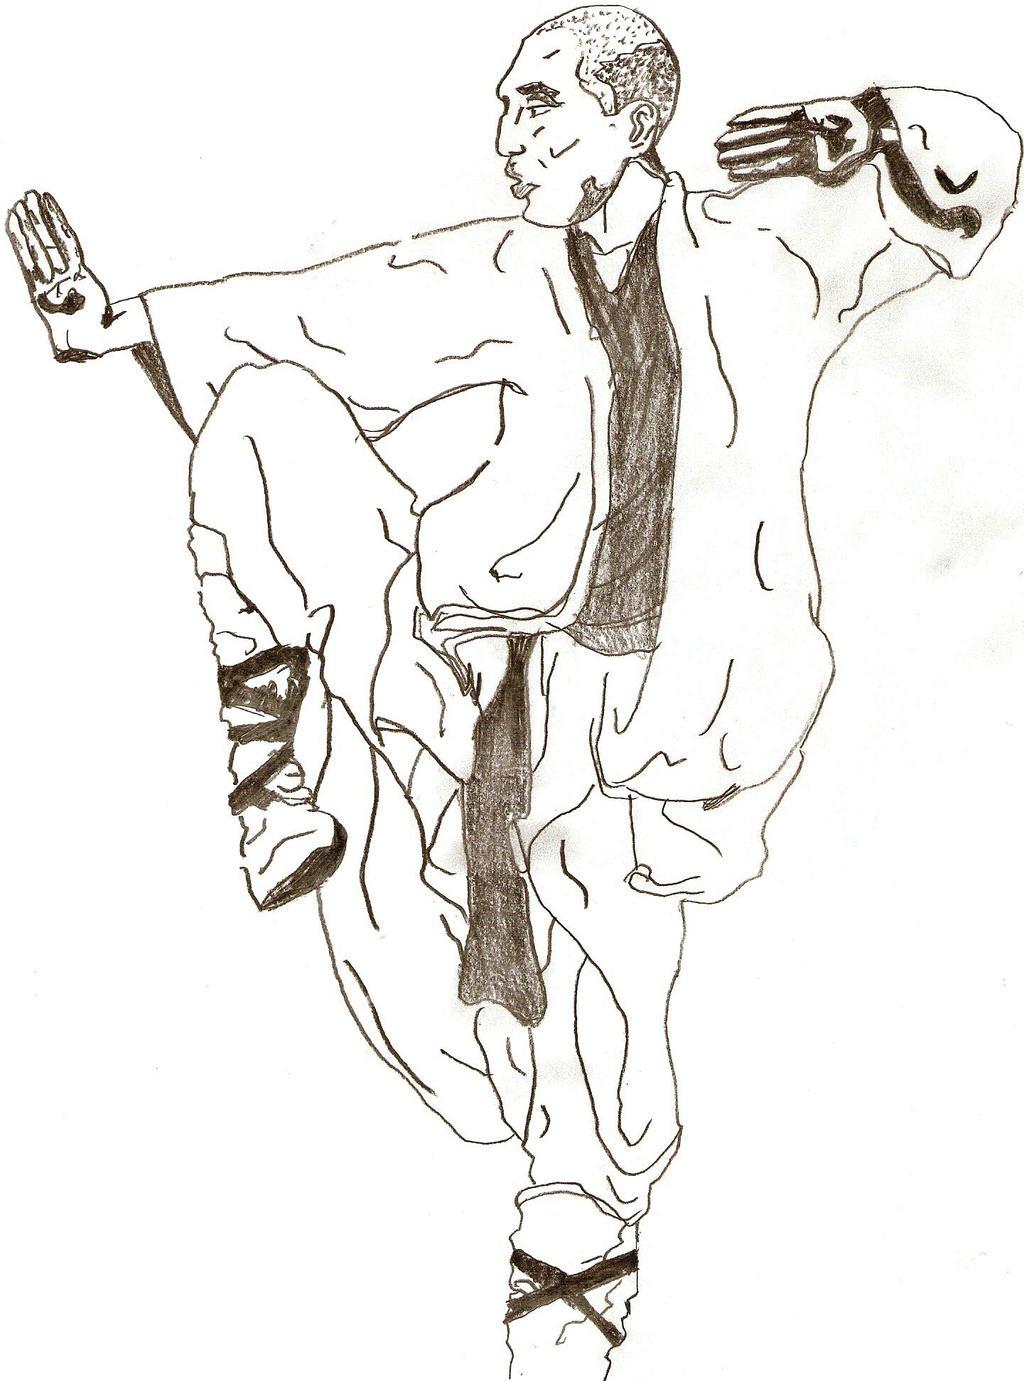 shaolin monk by ocblackwolf on deviantart